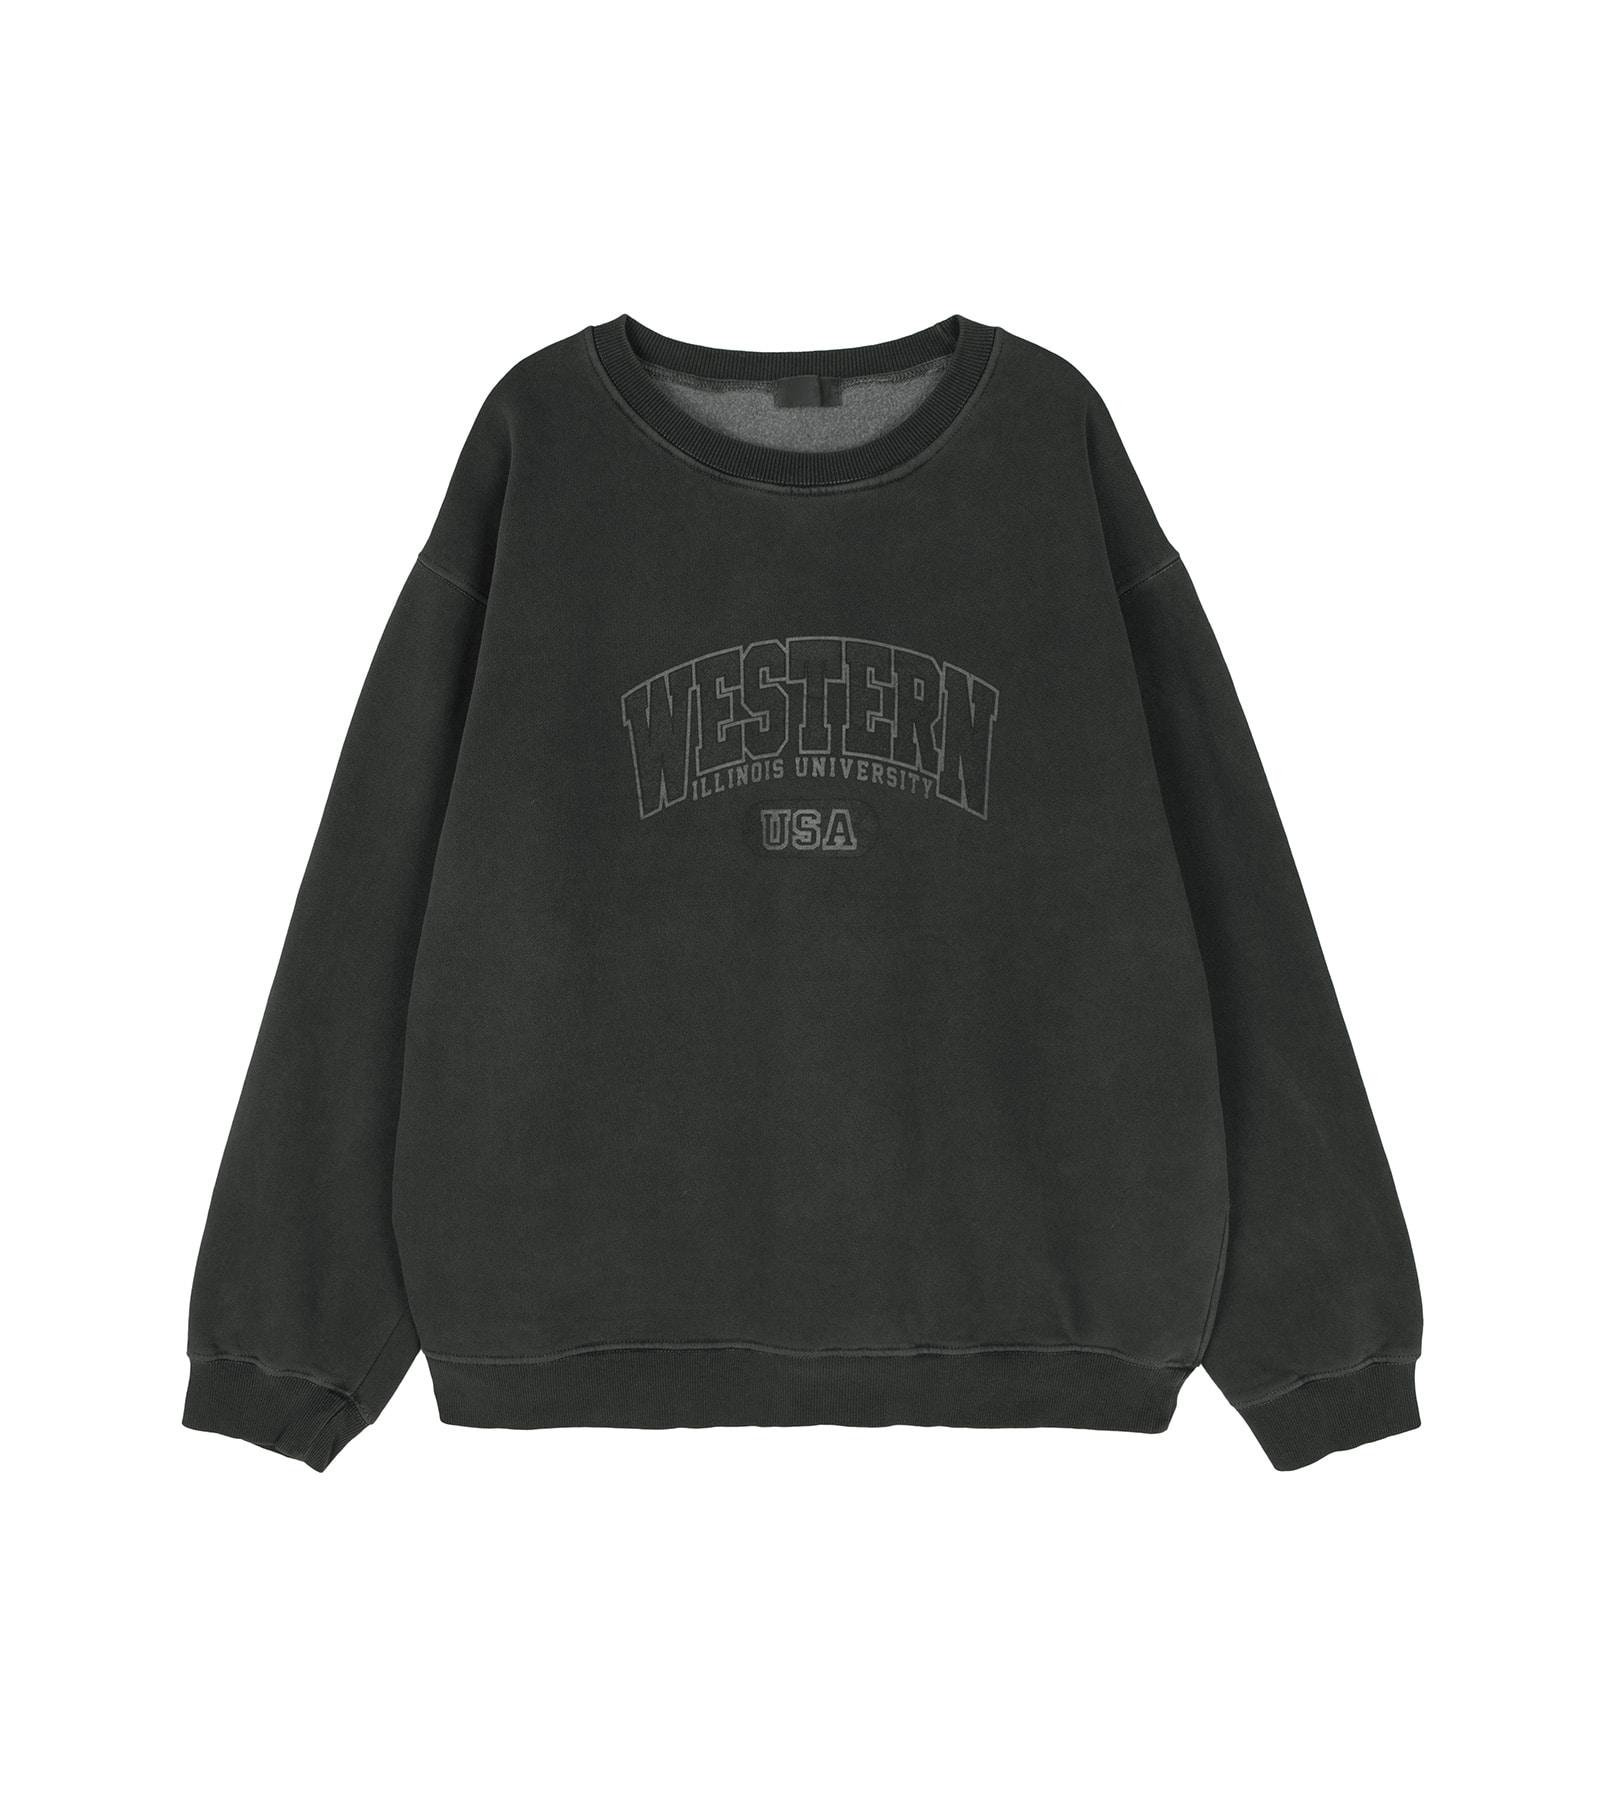 Western printed Fleece-lined crew neck sweatshirt